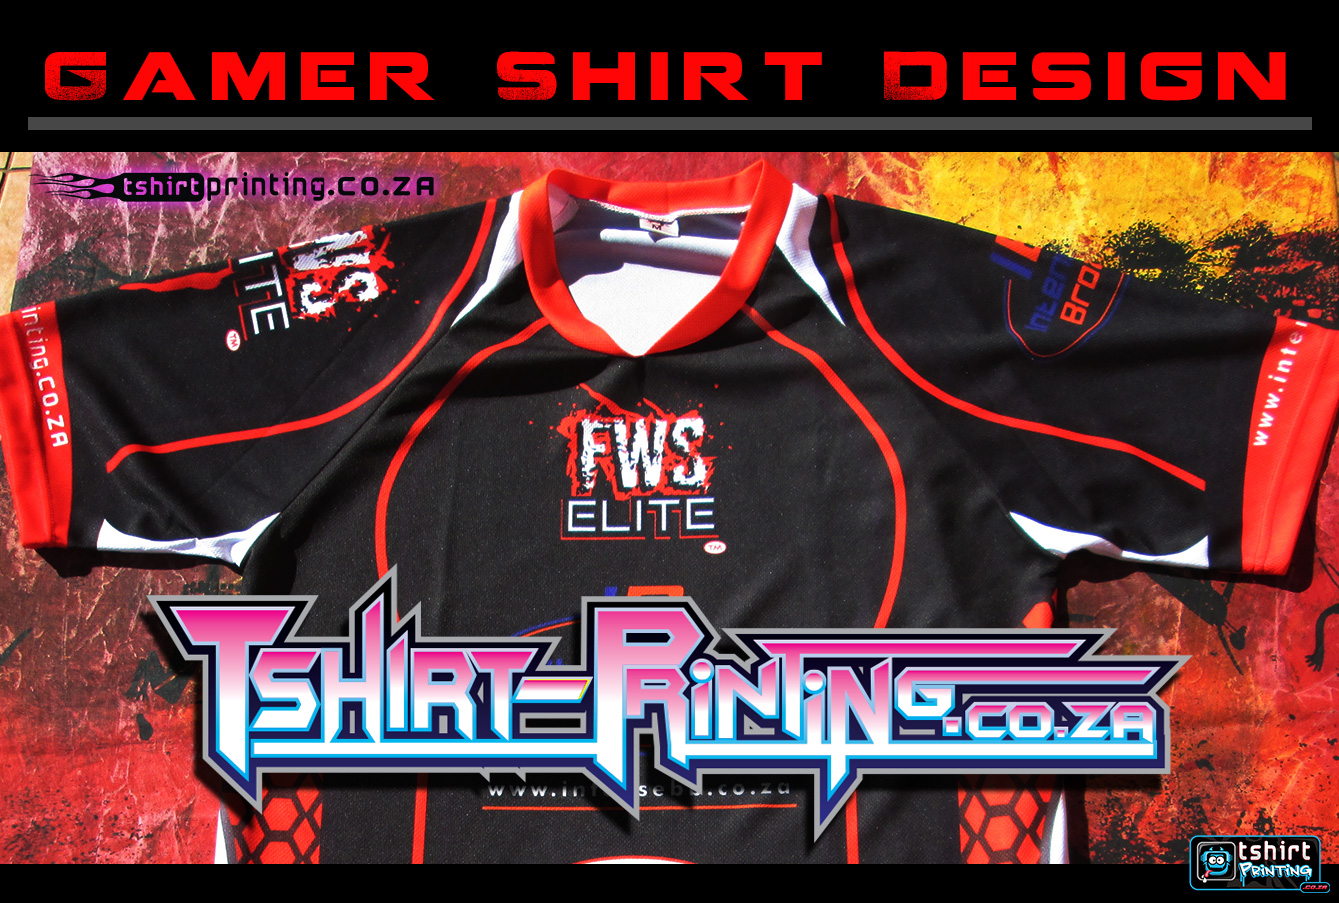 gamer-shirt-design